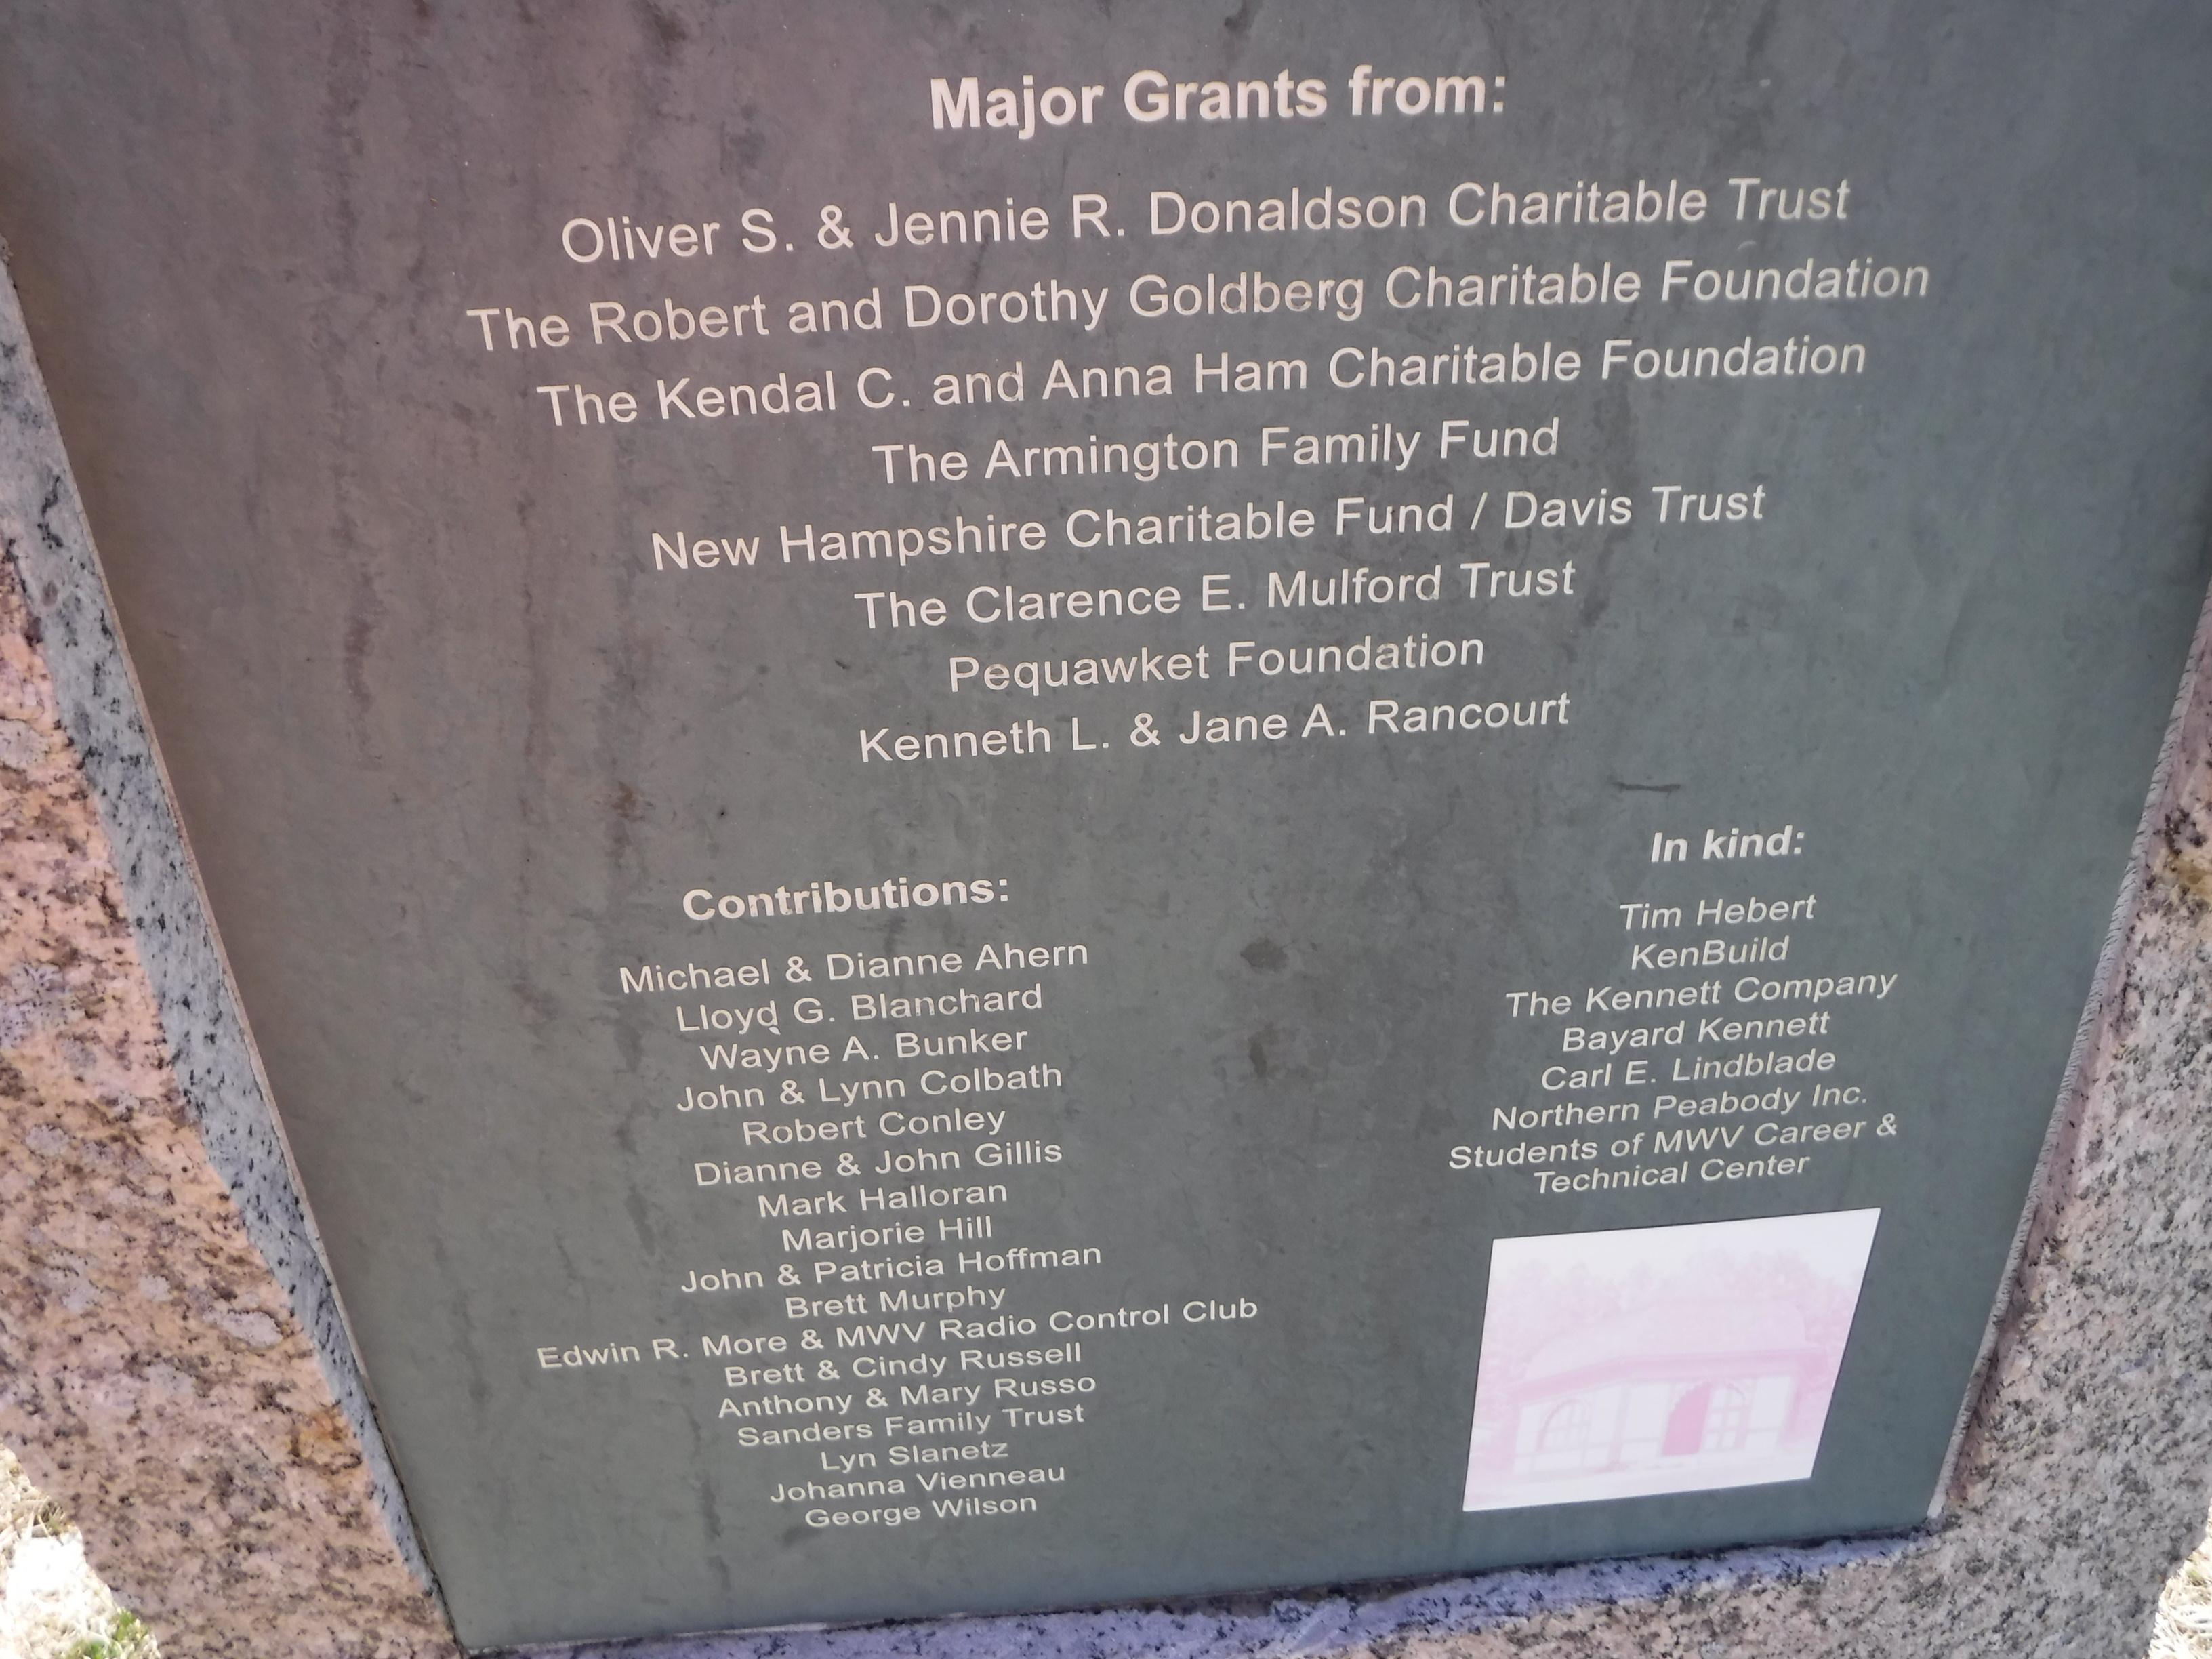 Bottom part of plaque